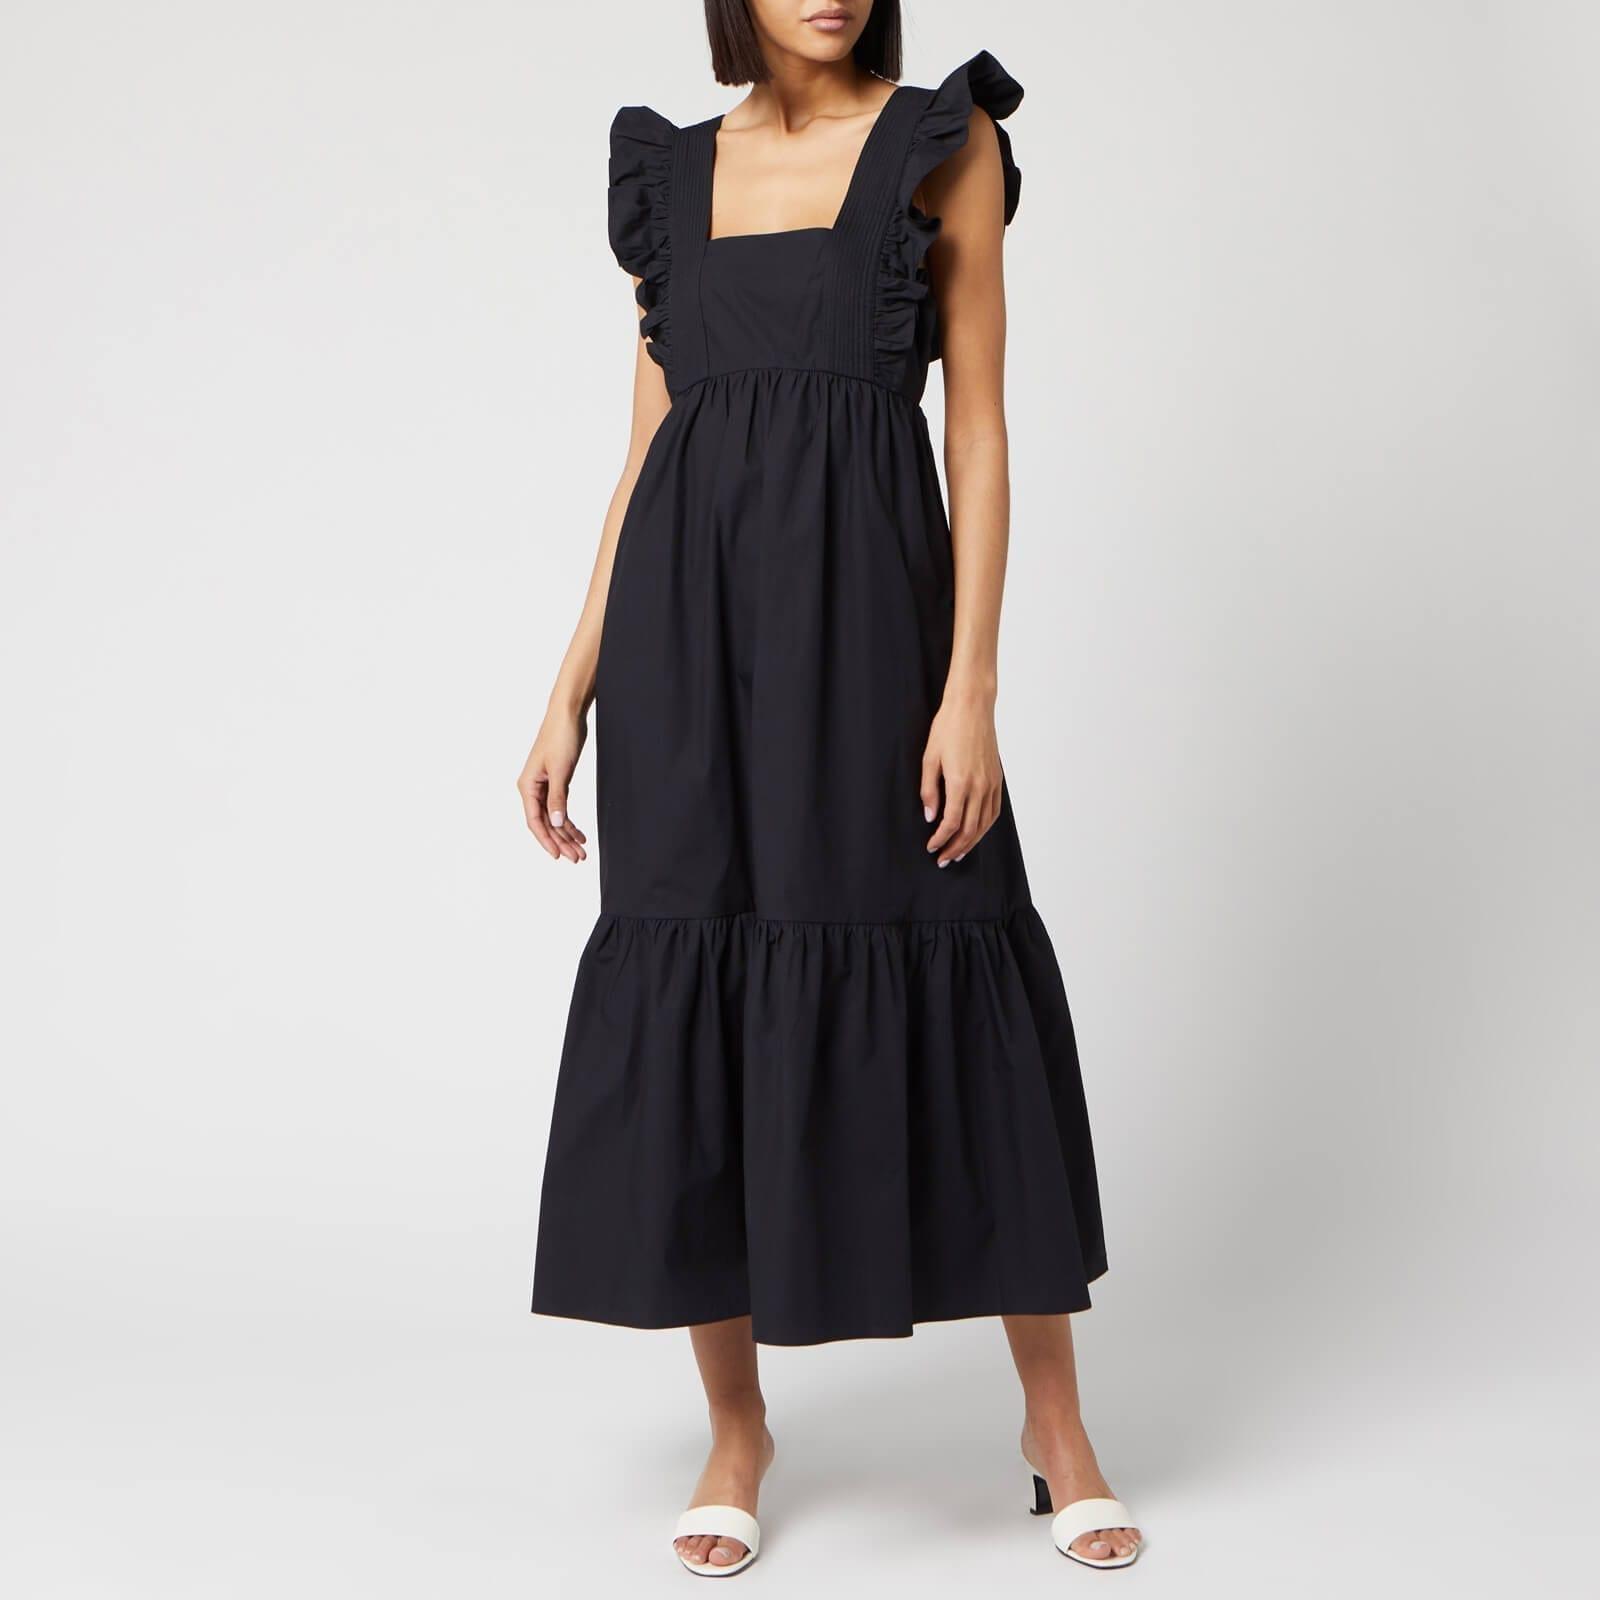 SELF PORTRAIT Women's Black Cotton Poplin Midi Dress   We Select ...